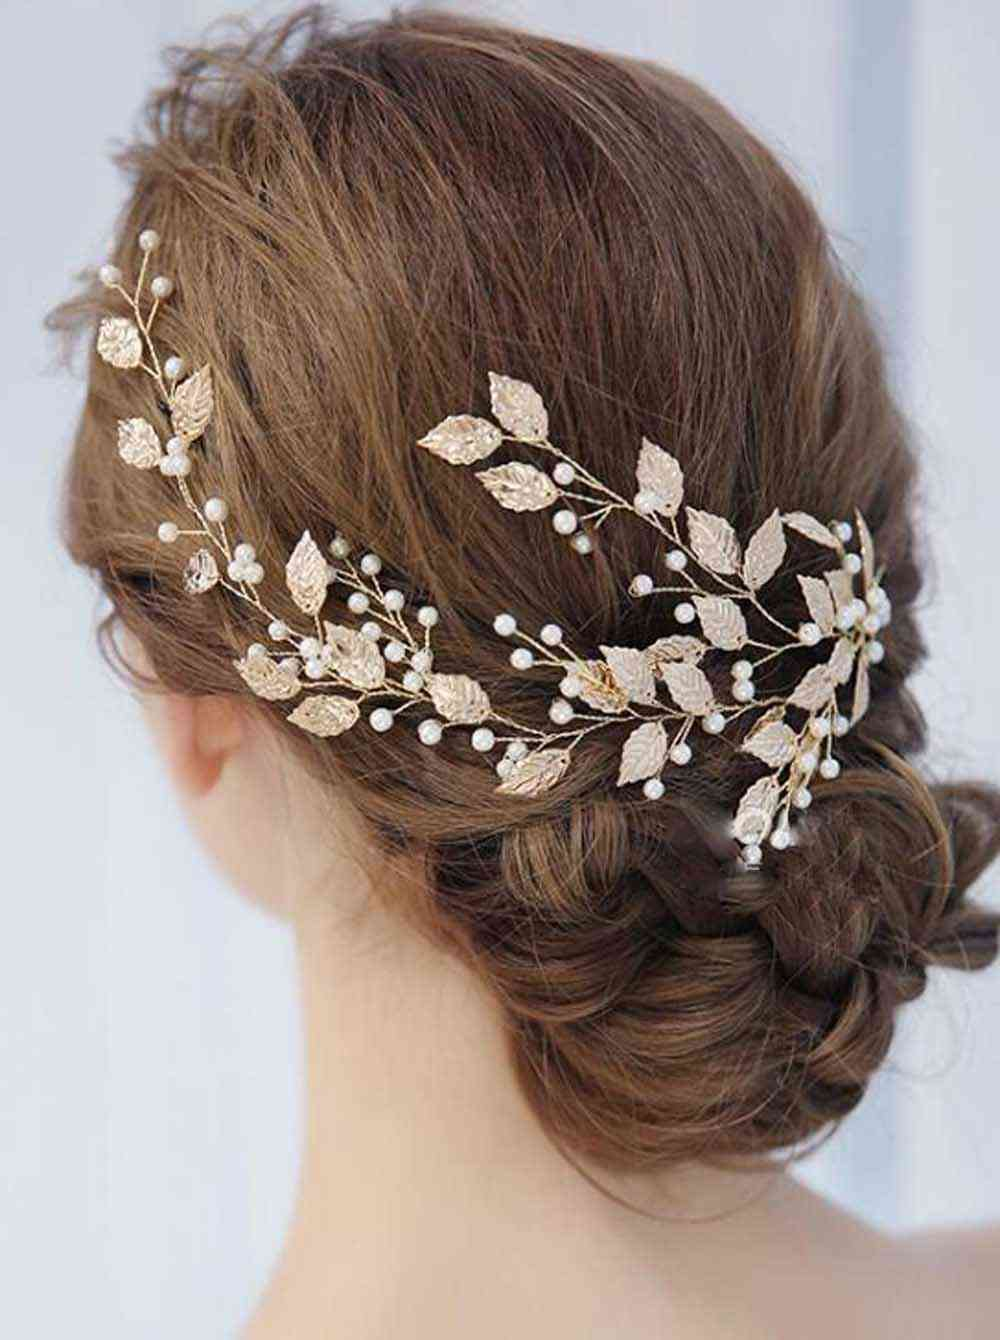 Vintage Leaves And Floral, Crystal Pearl Flower Headband - Hair Accessories